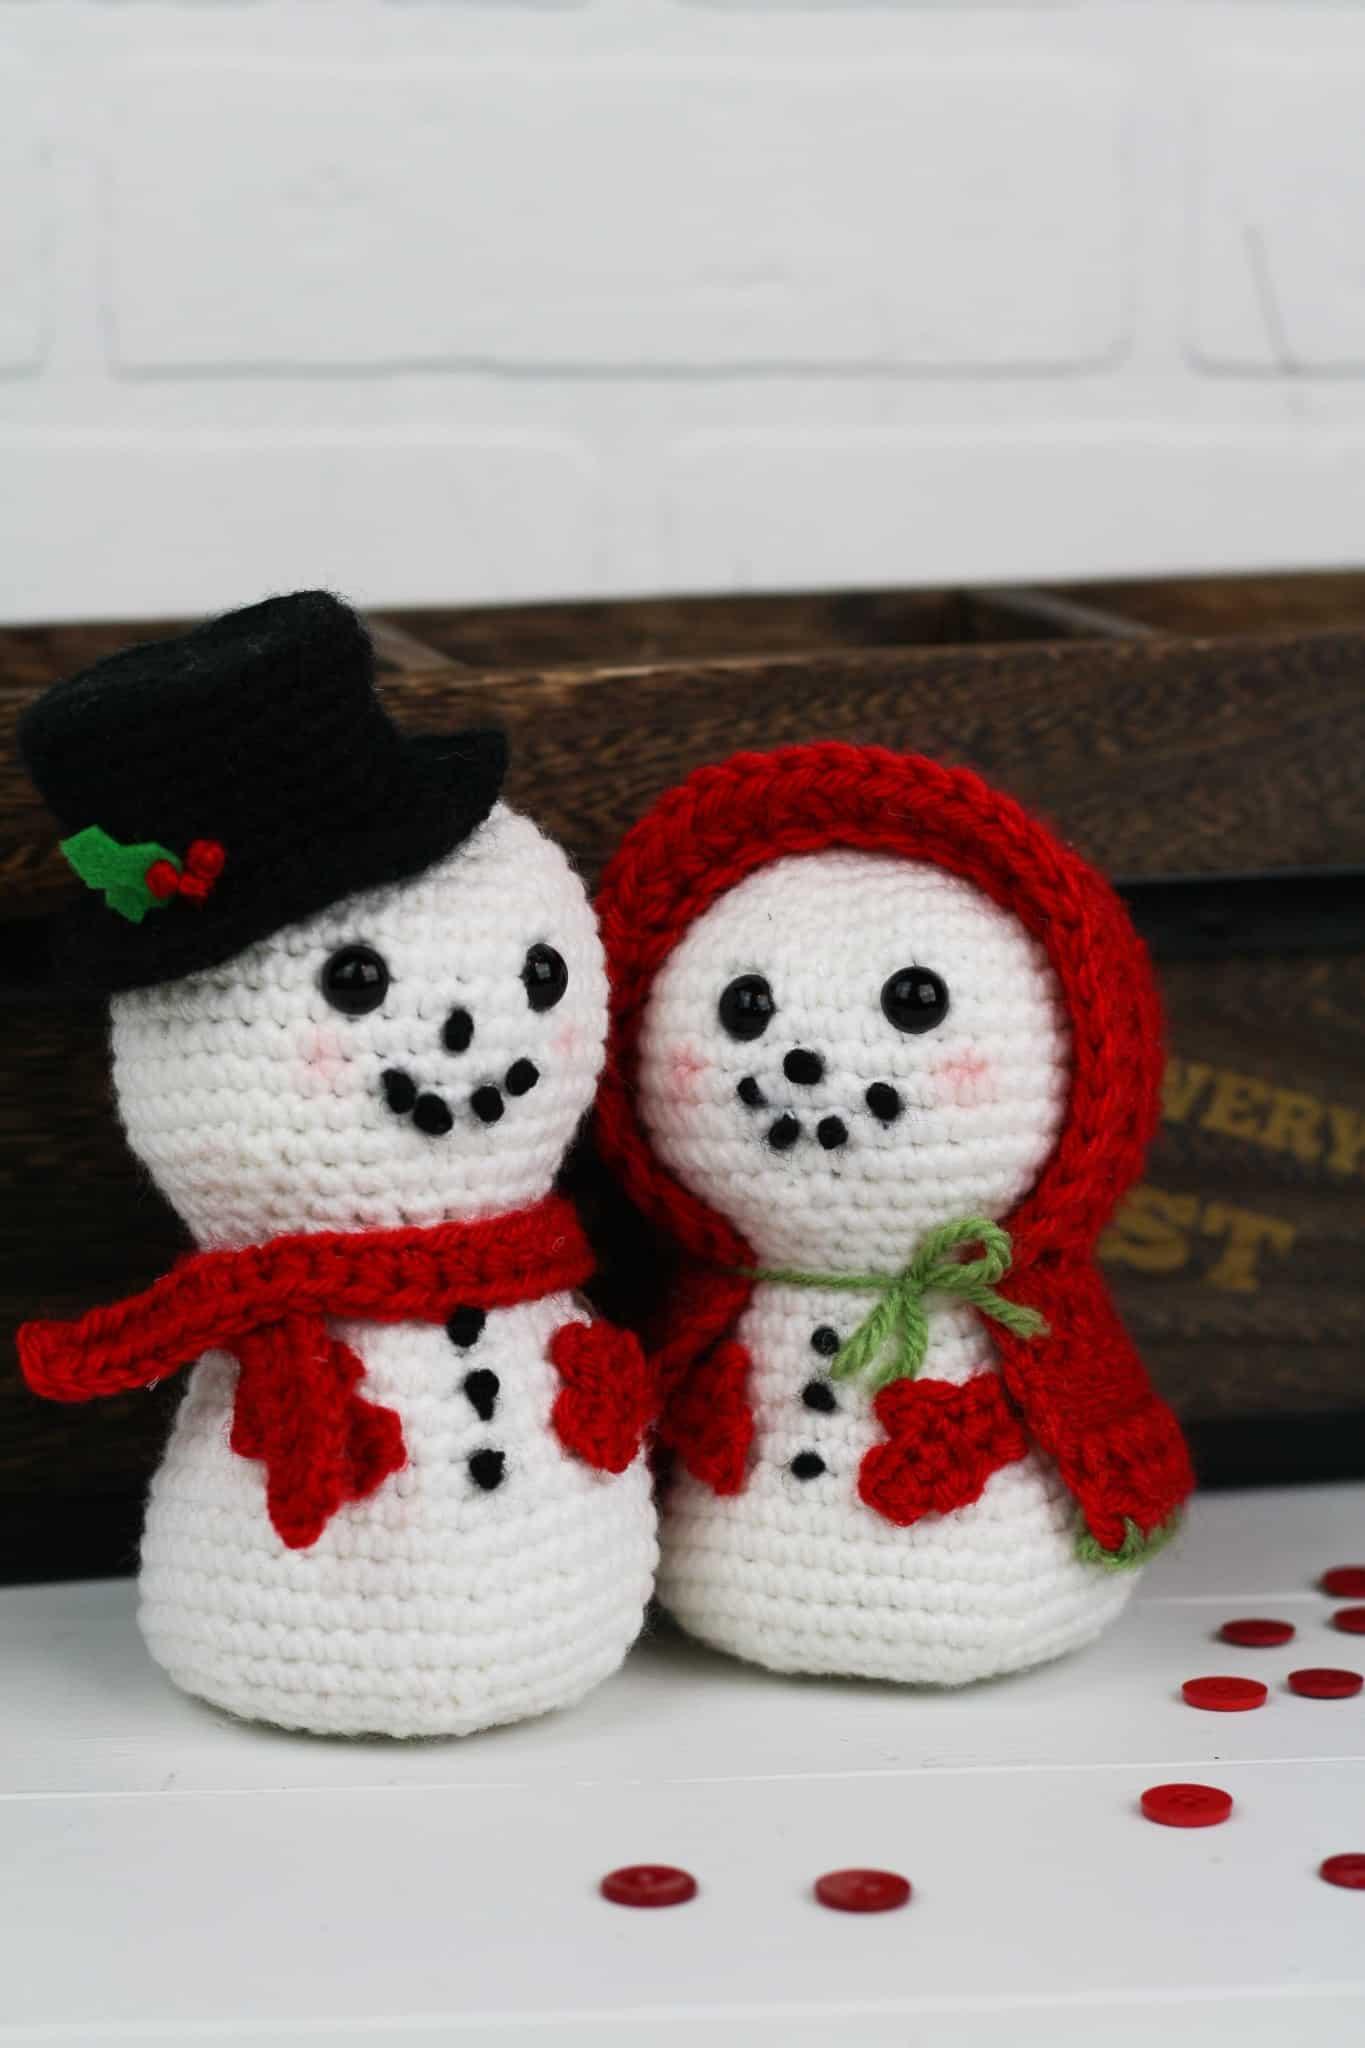 Crochet Snowman - Christmas Snowman - Amigurumi Snowman - Colored ...   2048x1365